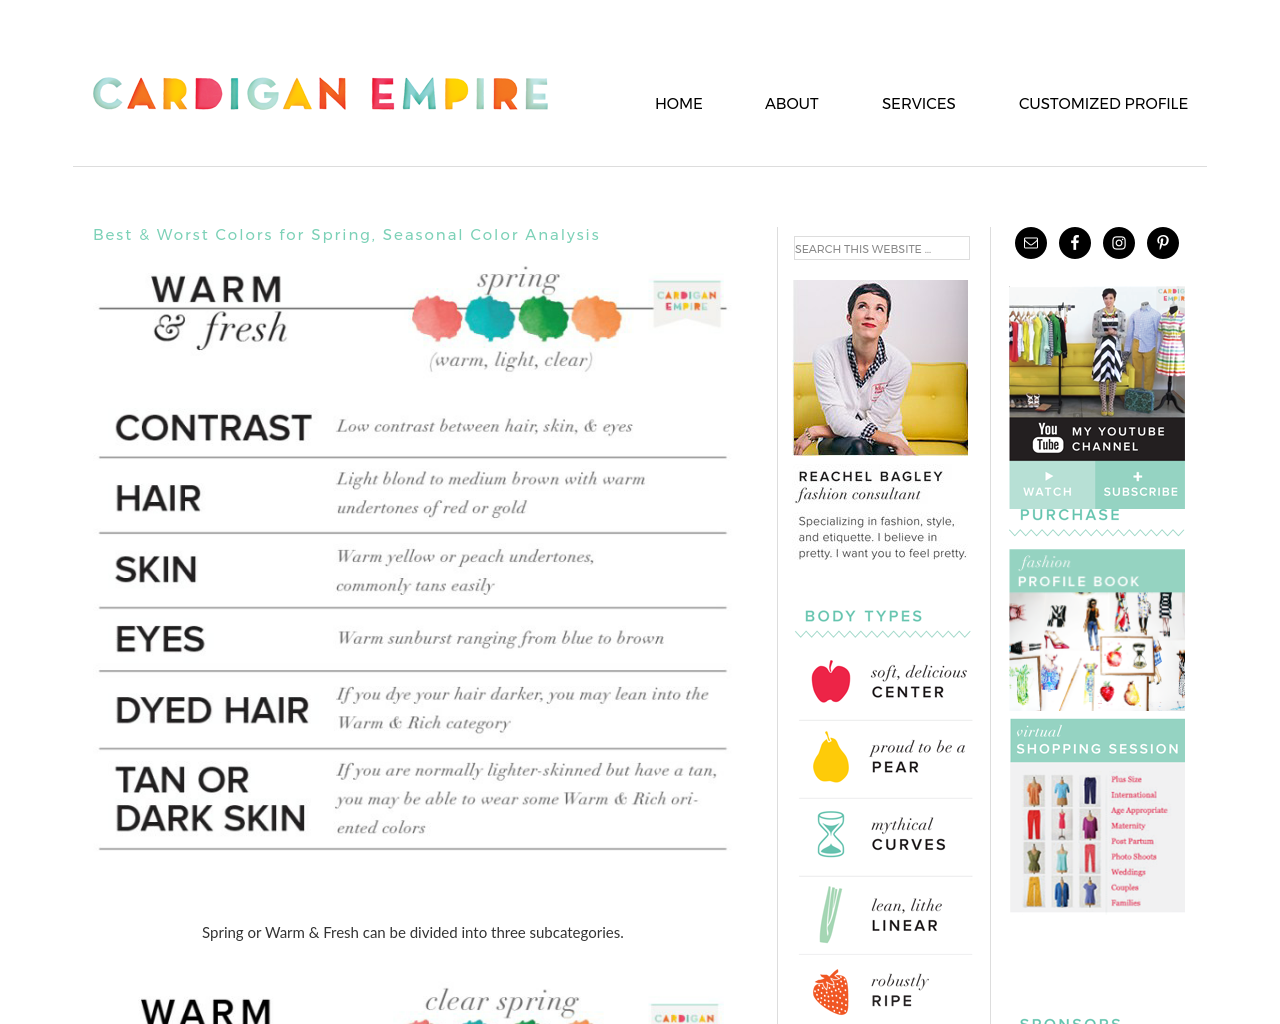 Cardigan-Empire-Advertising-Reviews-Pricing